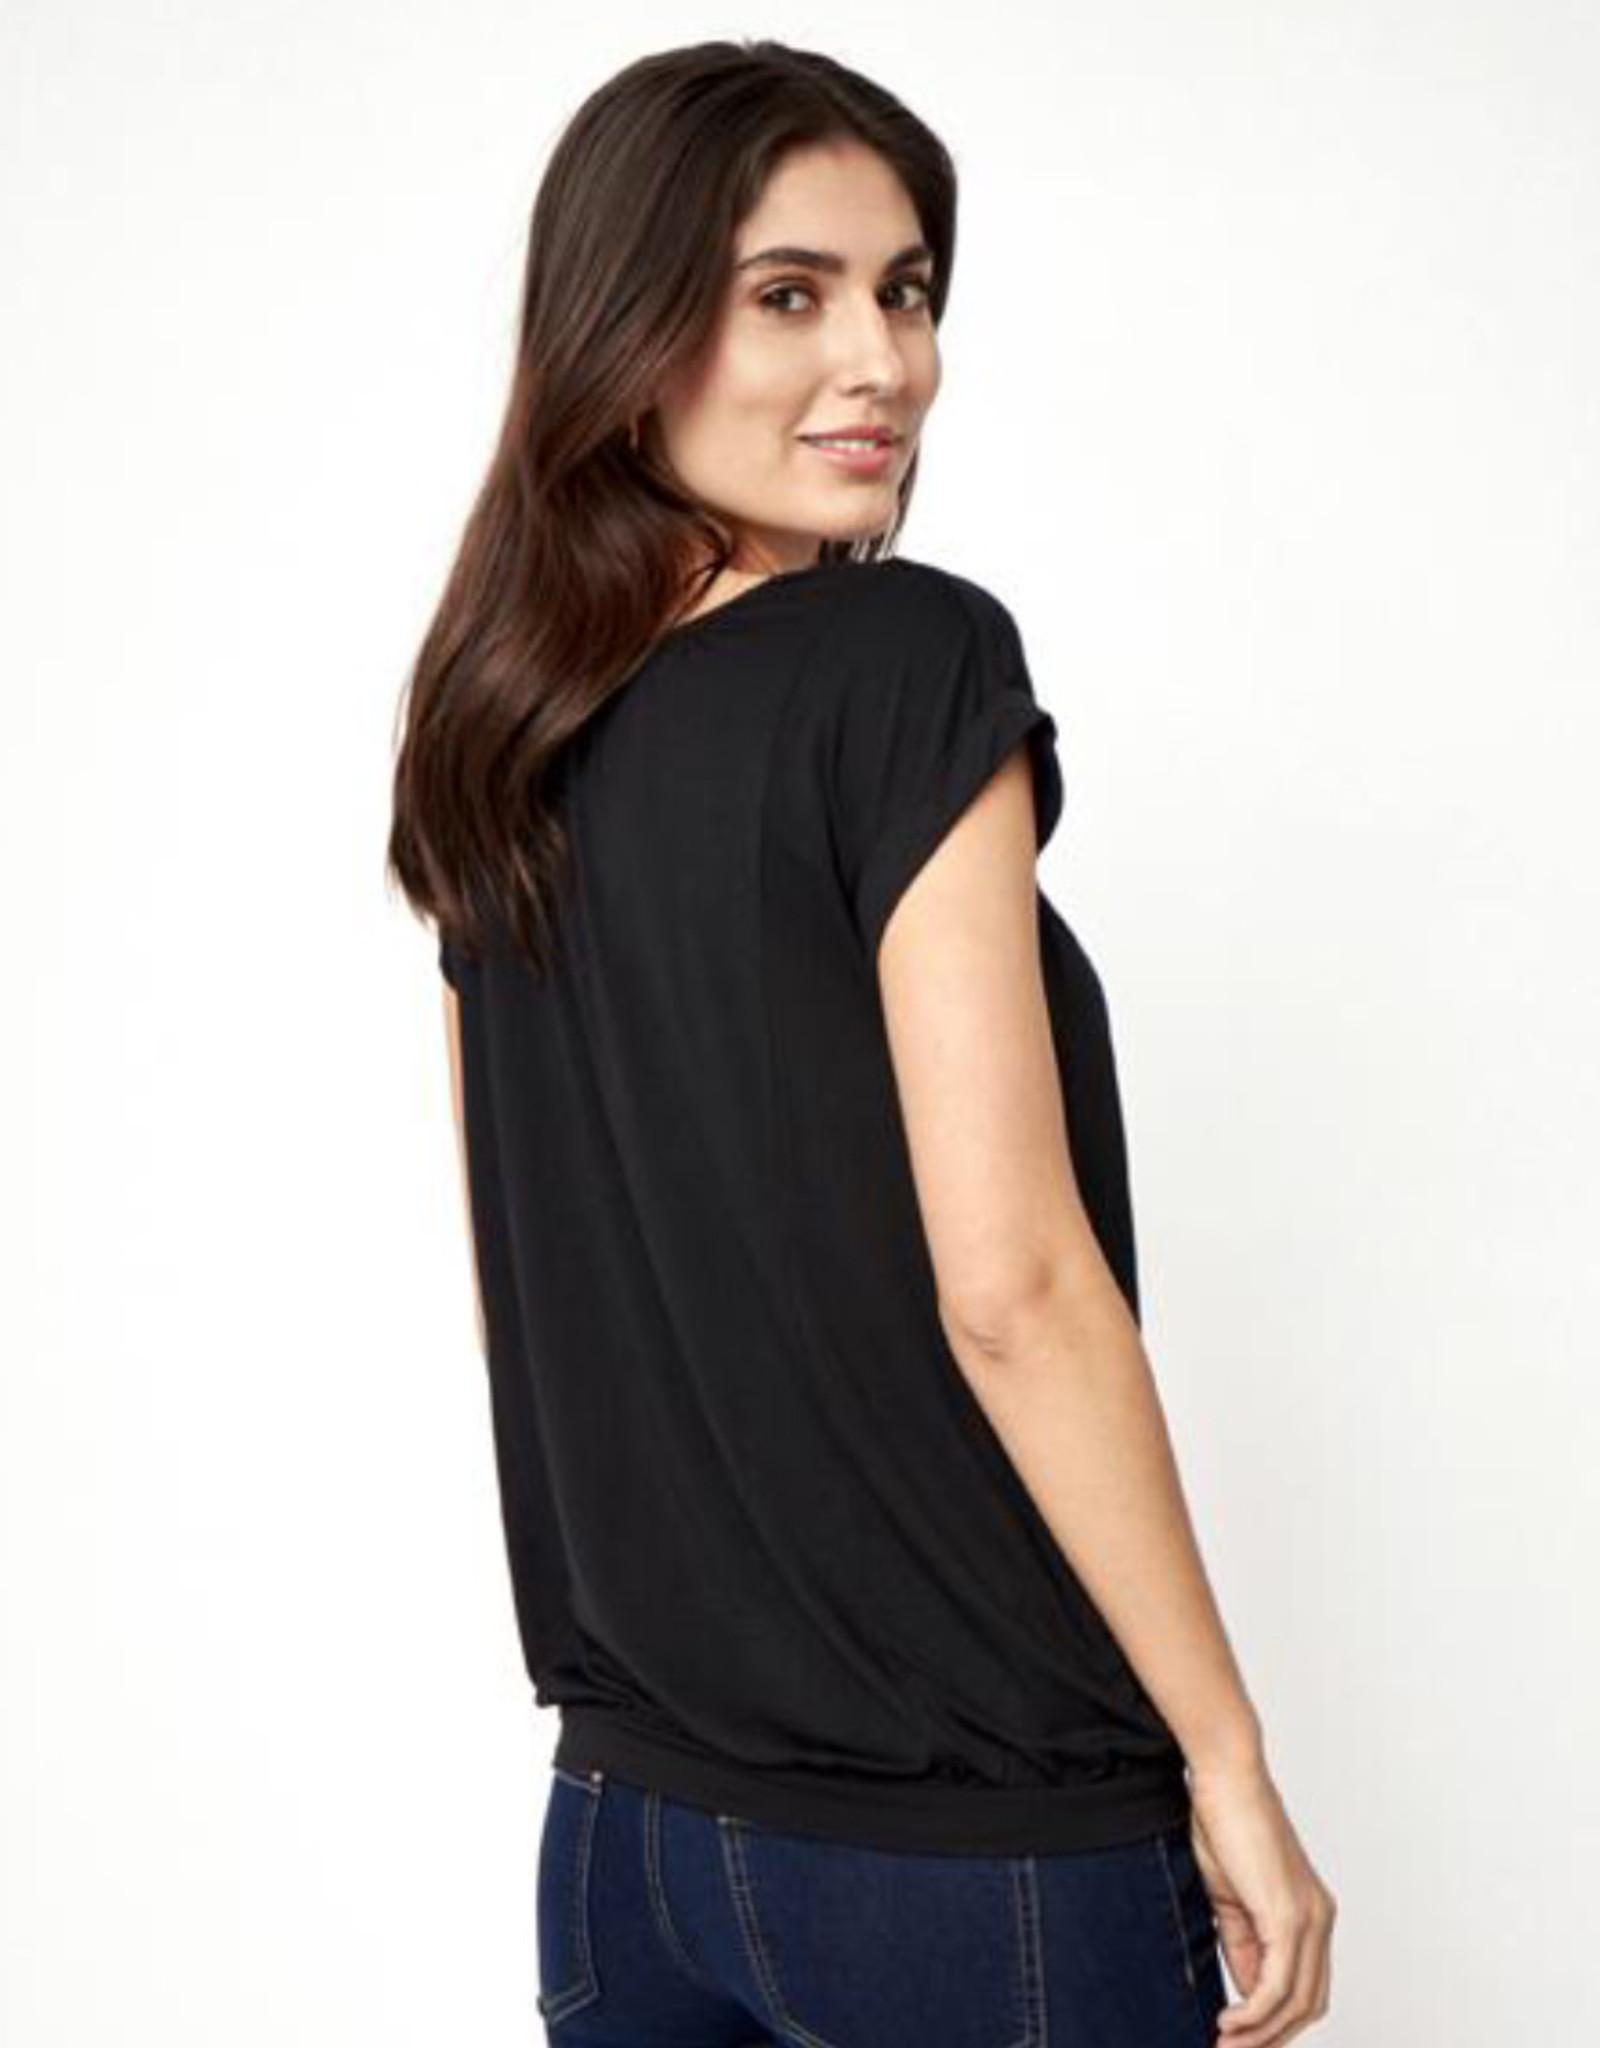 Soya Concept Soya Concept Marica 4 t-shirt